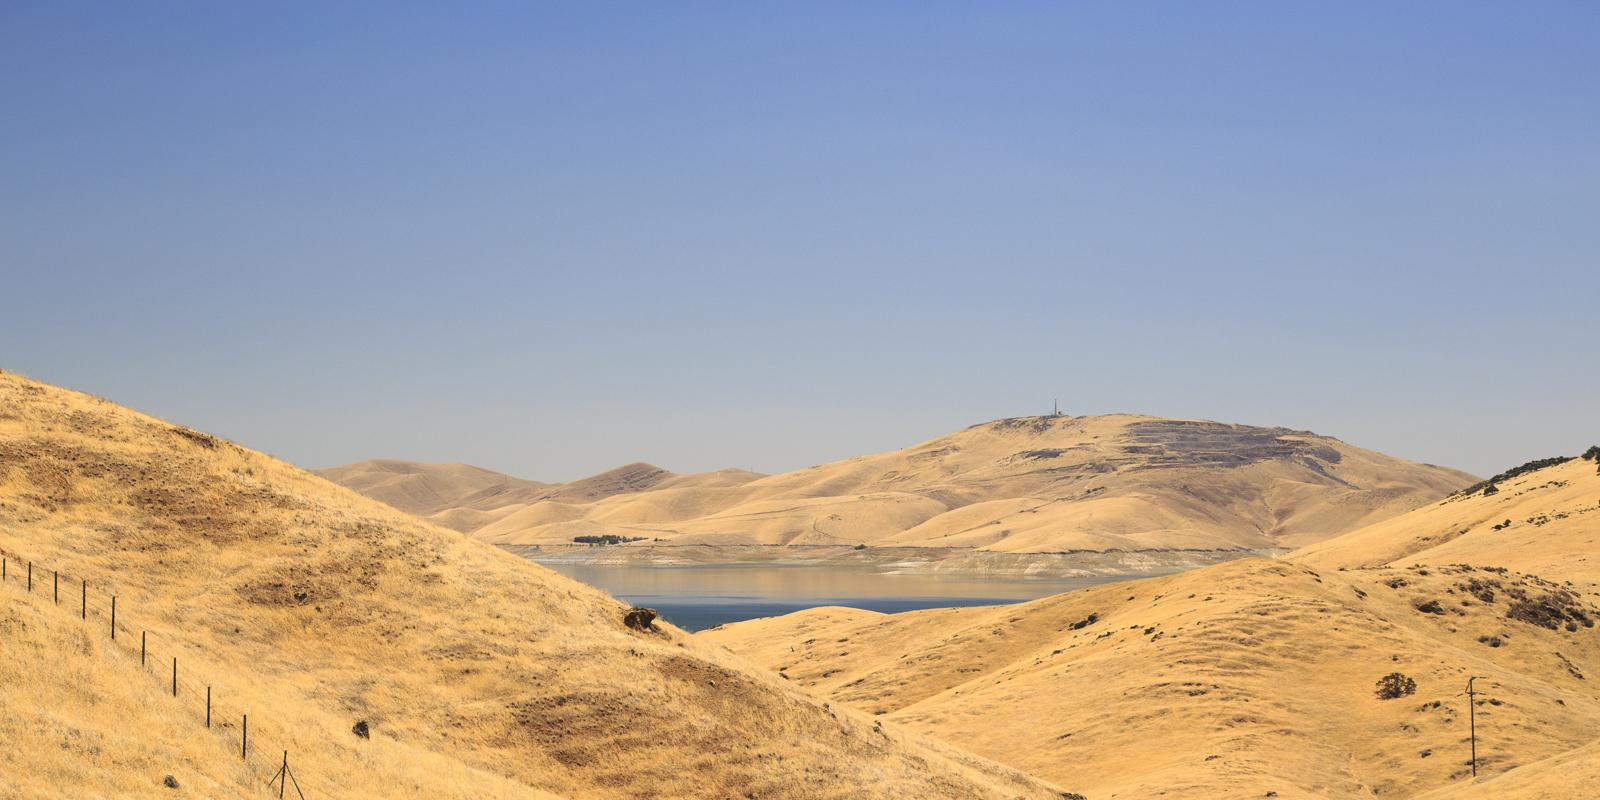 Jairo A Llano - fotografo paisaje-0906.jpg